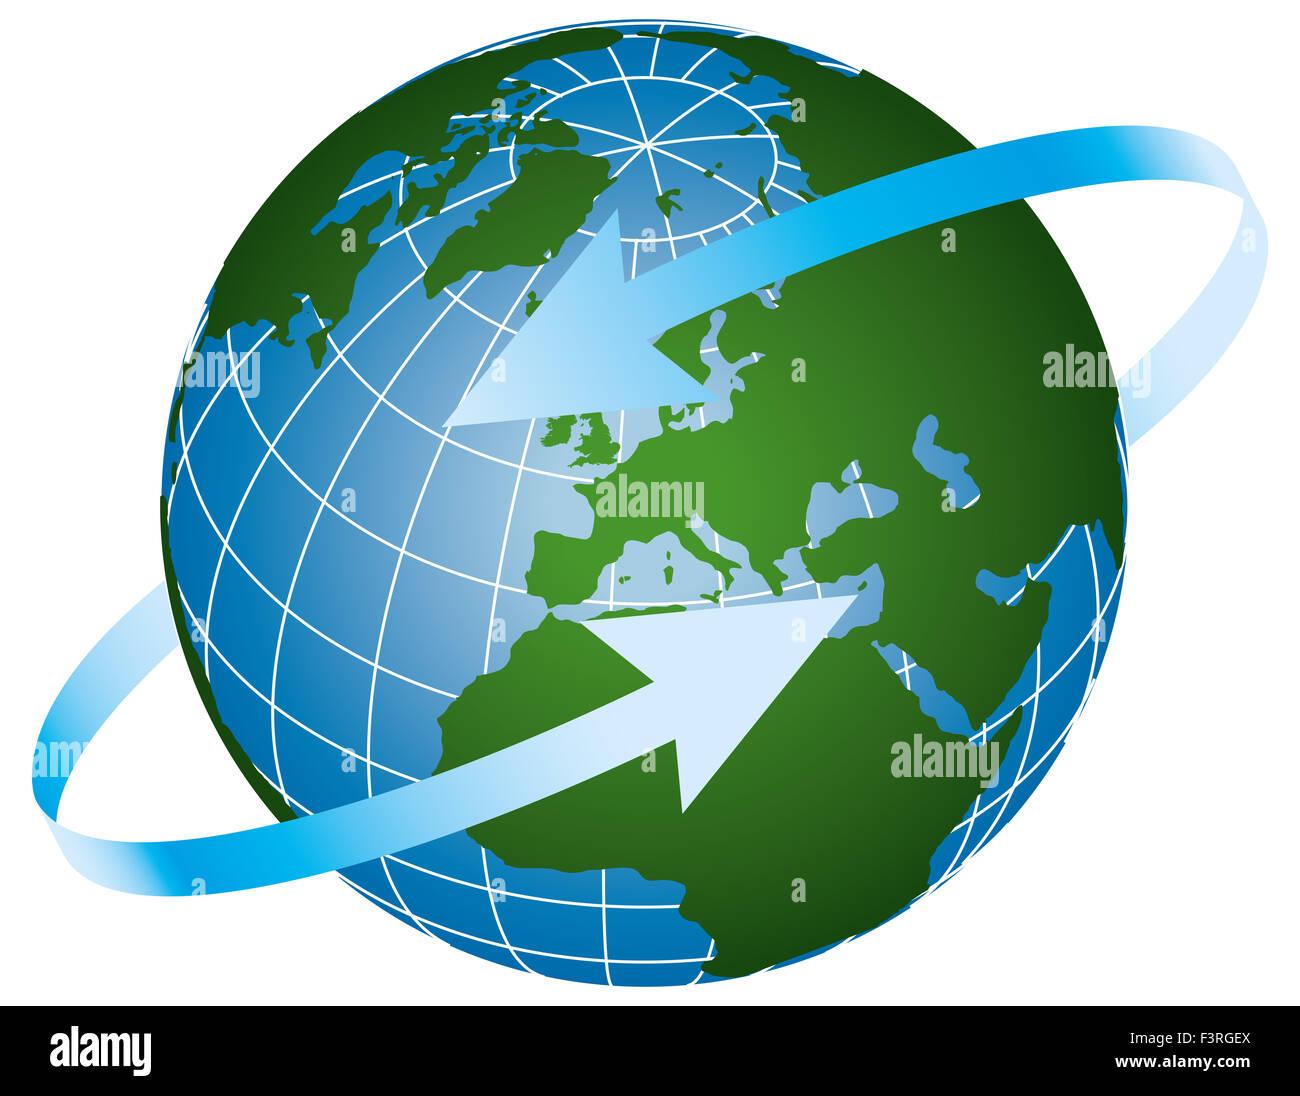 Global logo - Stock Image